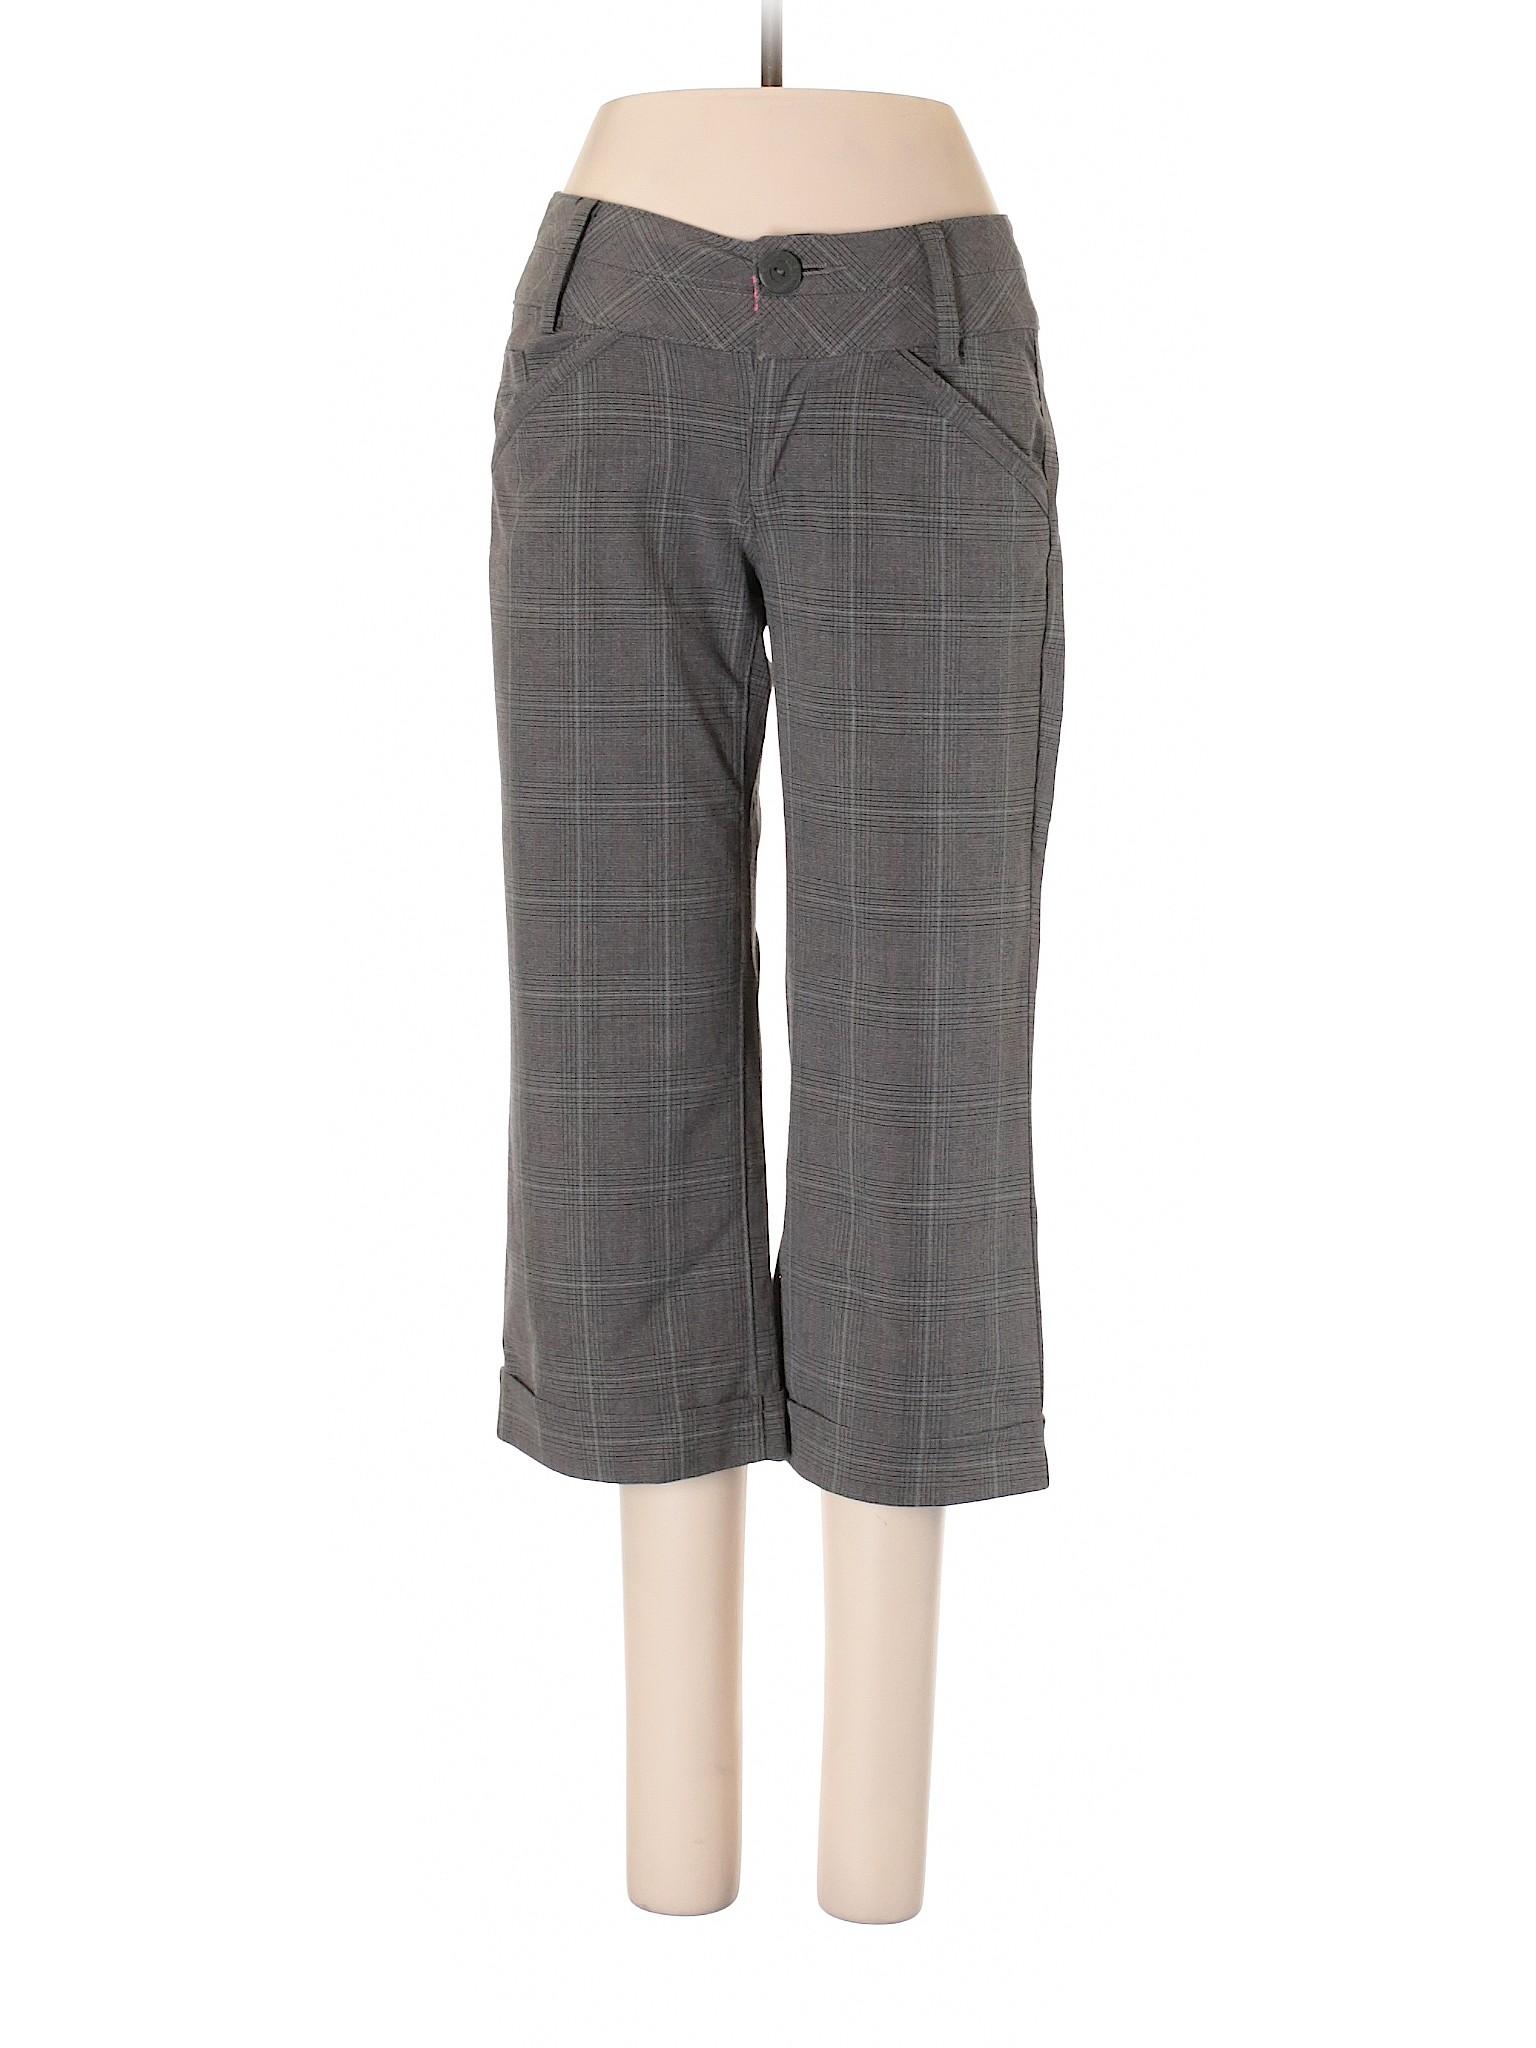 Leisure DKNY winter Jeans Pants Dress 8r8qY